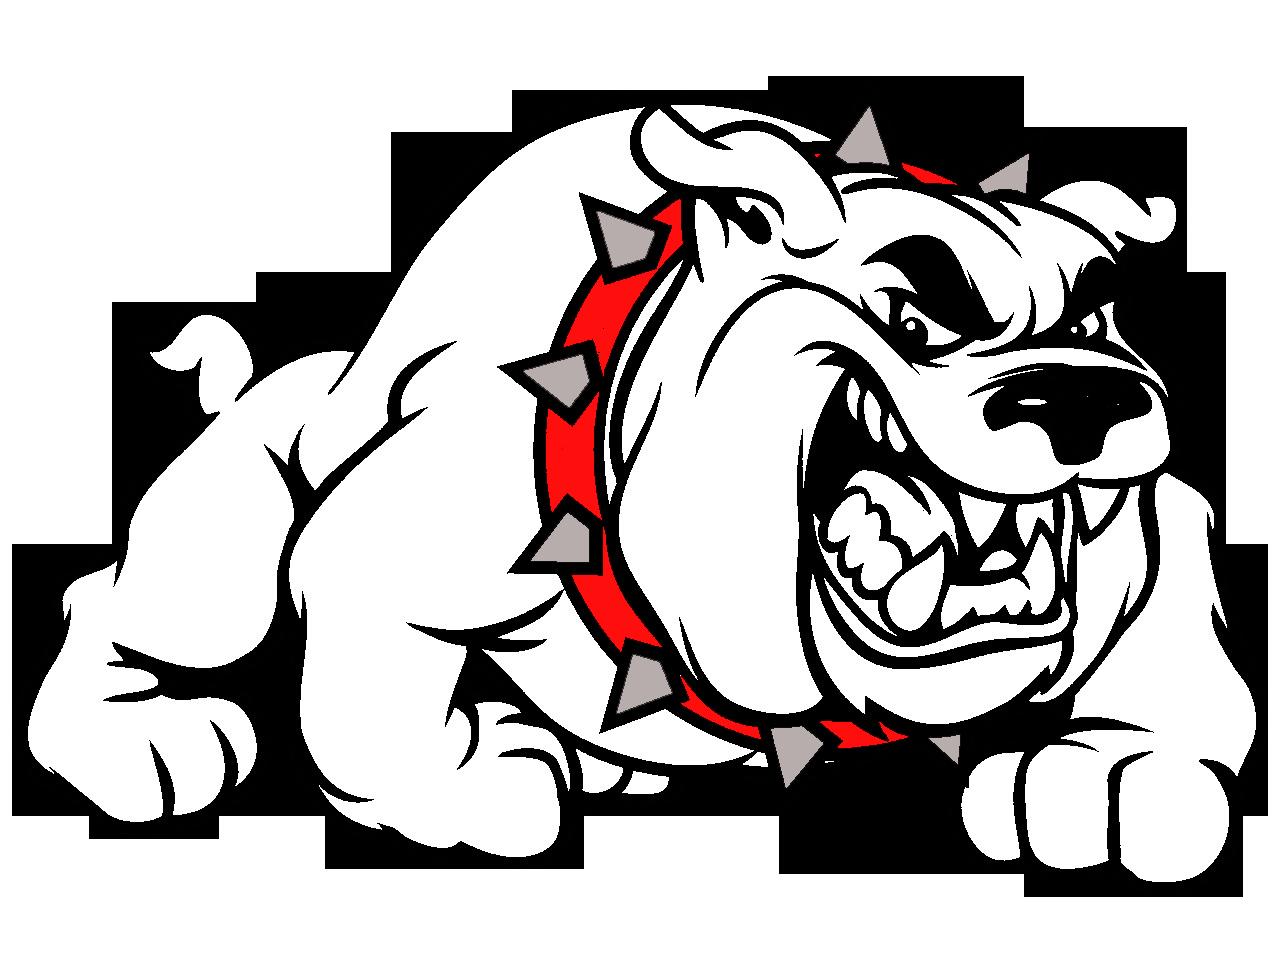 Georgia bulldog clipart free png black and white library Free Georgia Bulldogs Clipart, Download Free Clip Art, Free Clip Art ... png black and white library